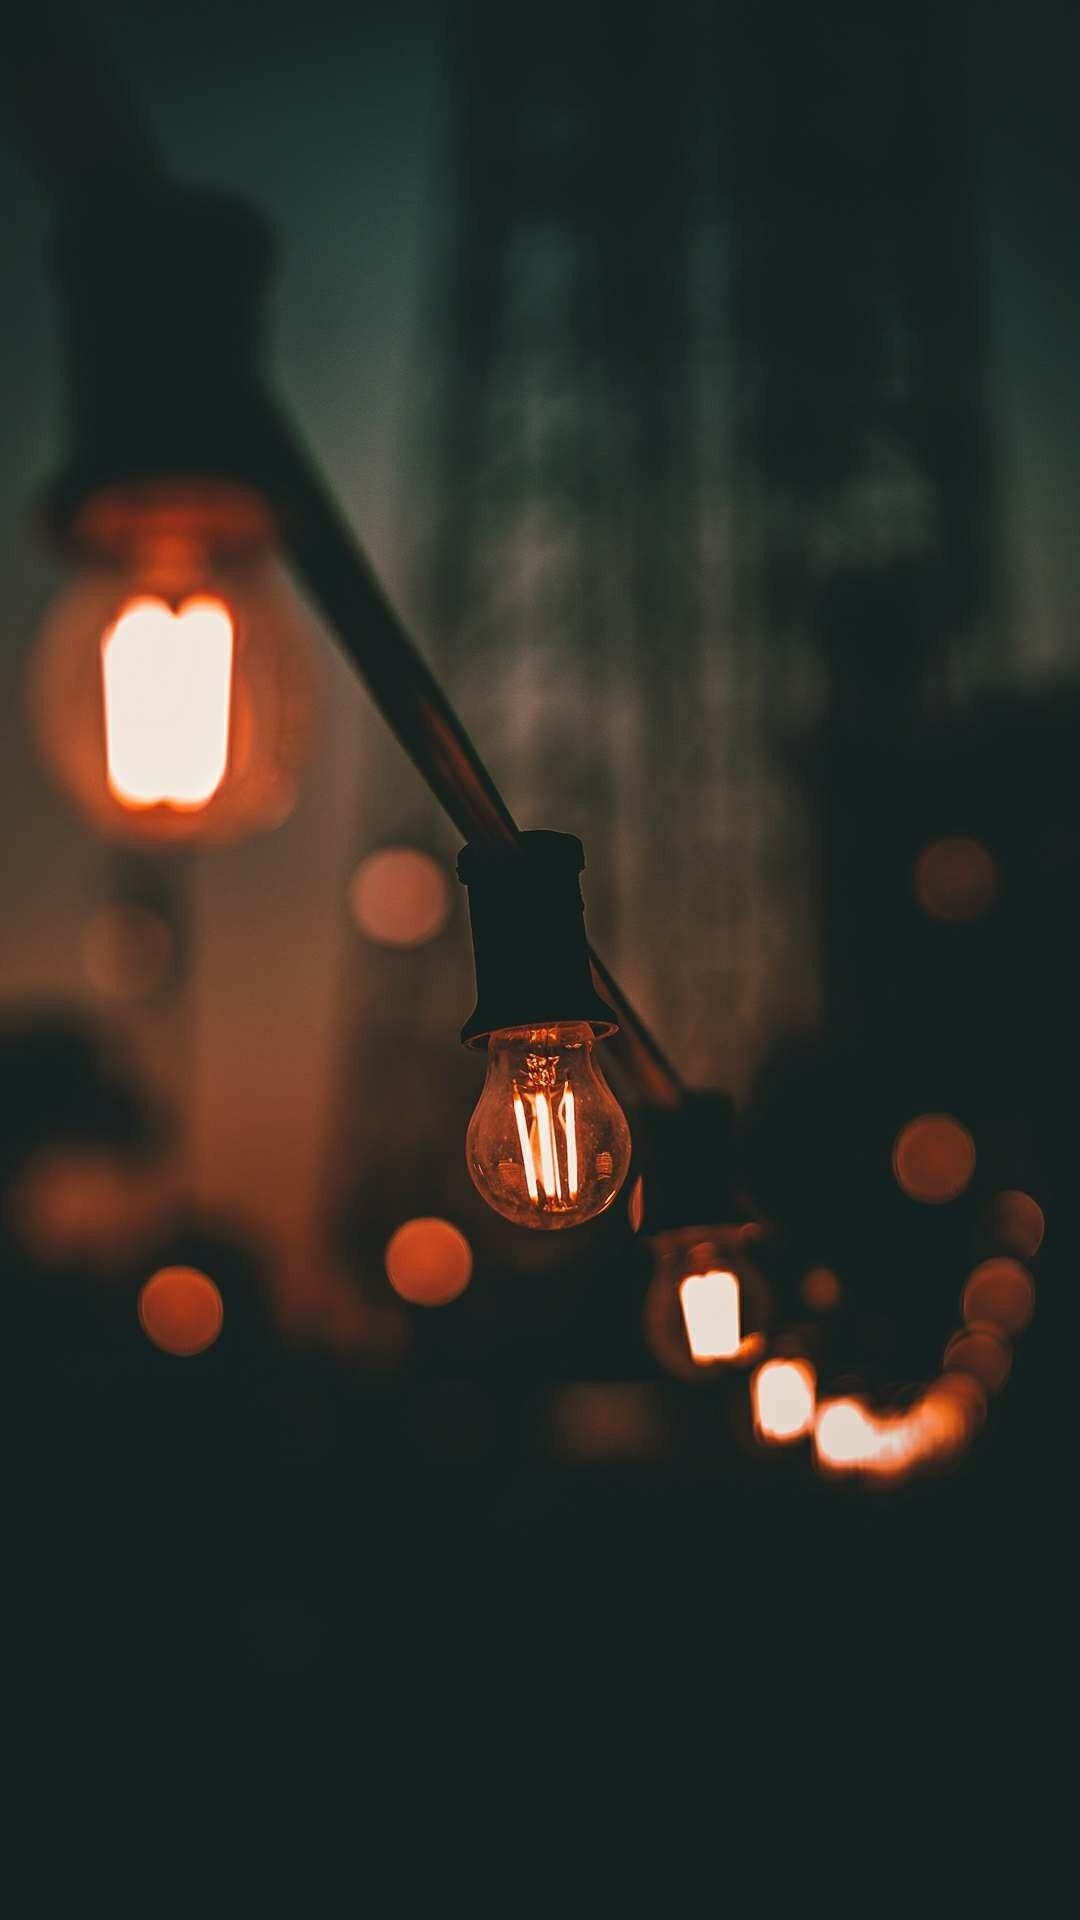 Light wallpaper for iPhone